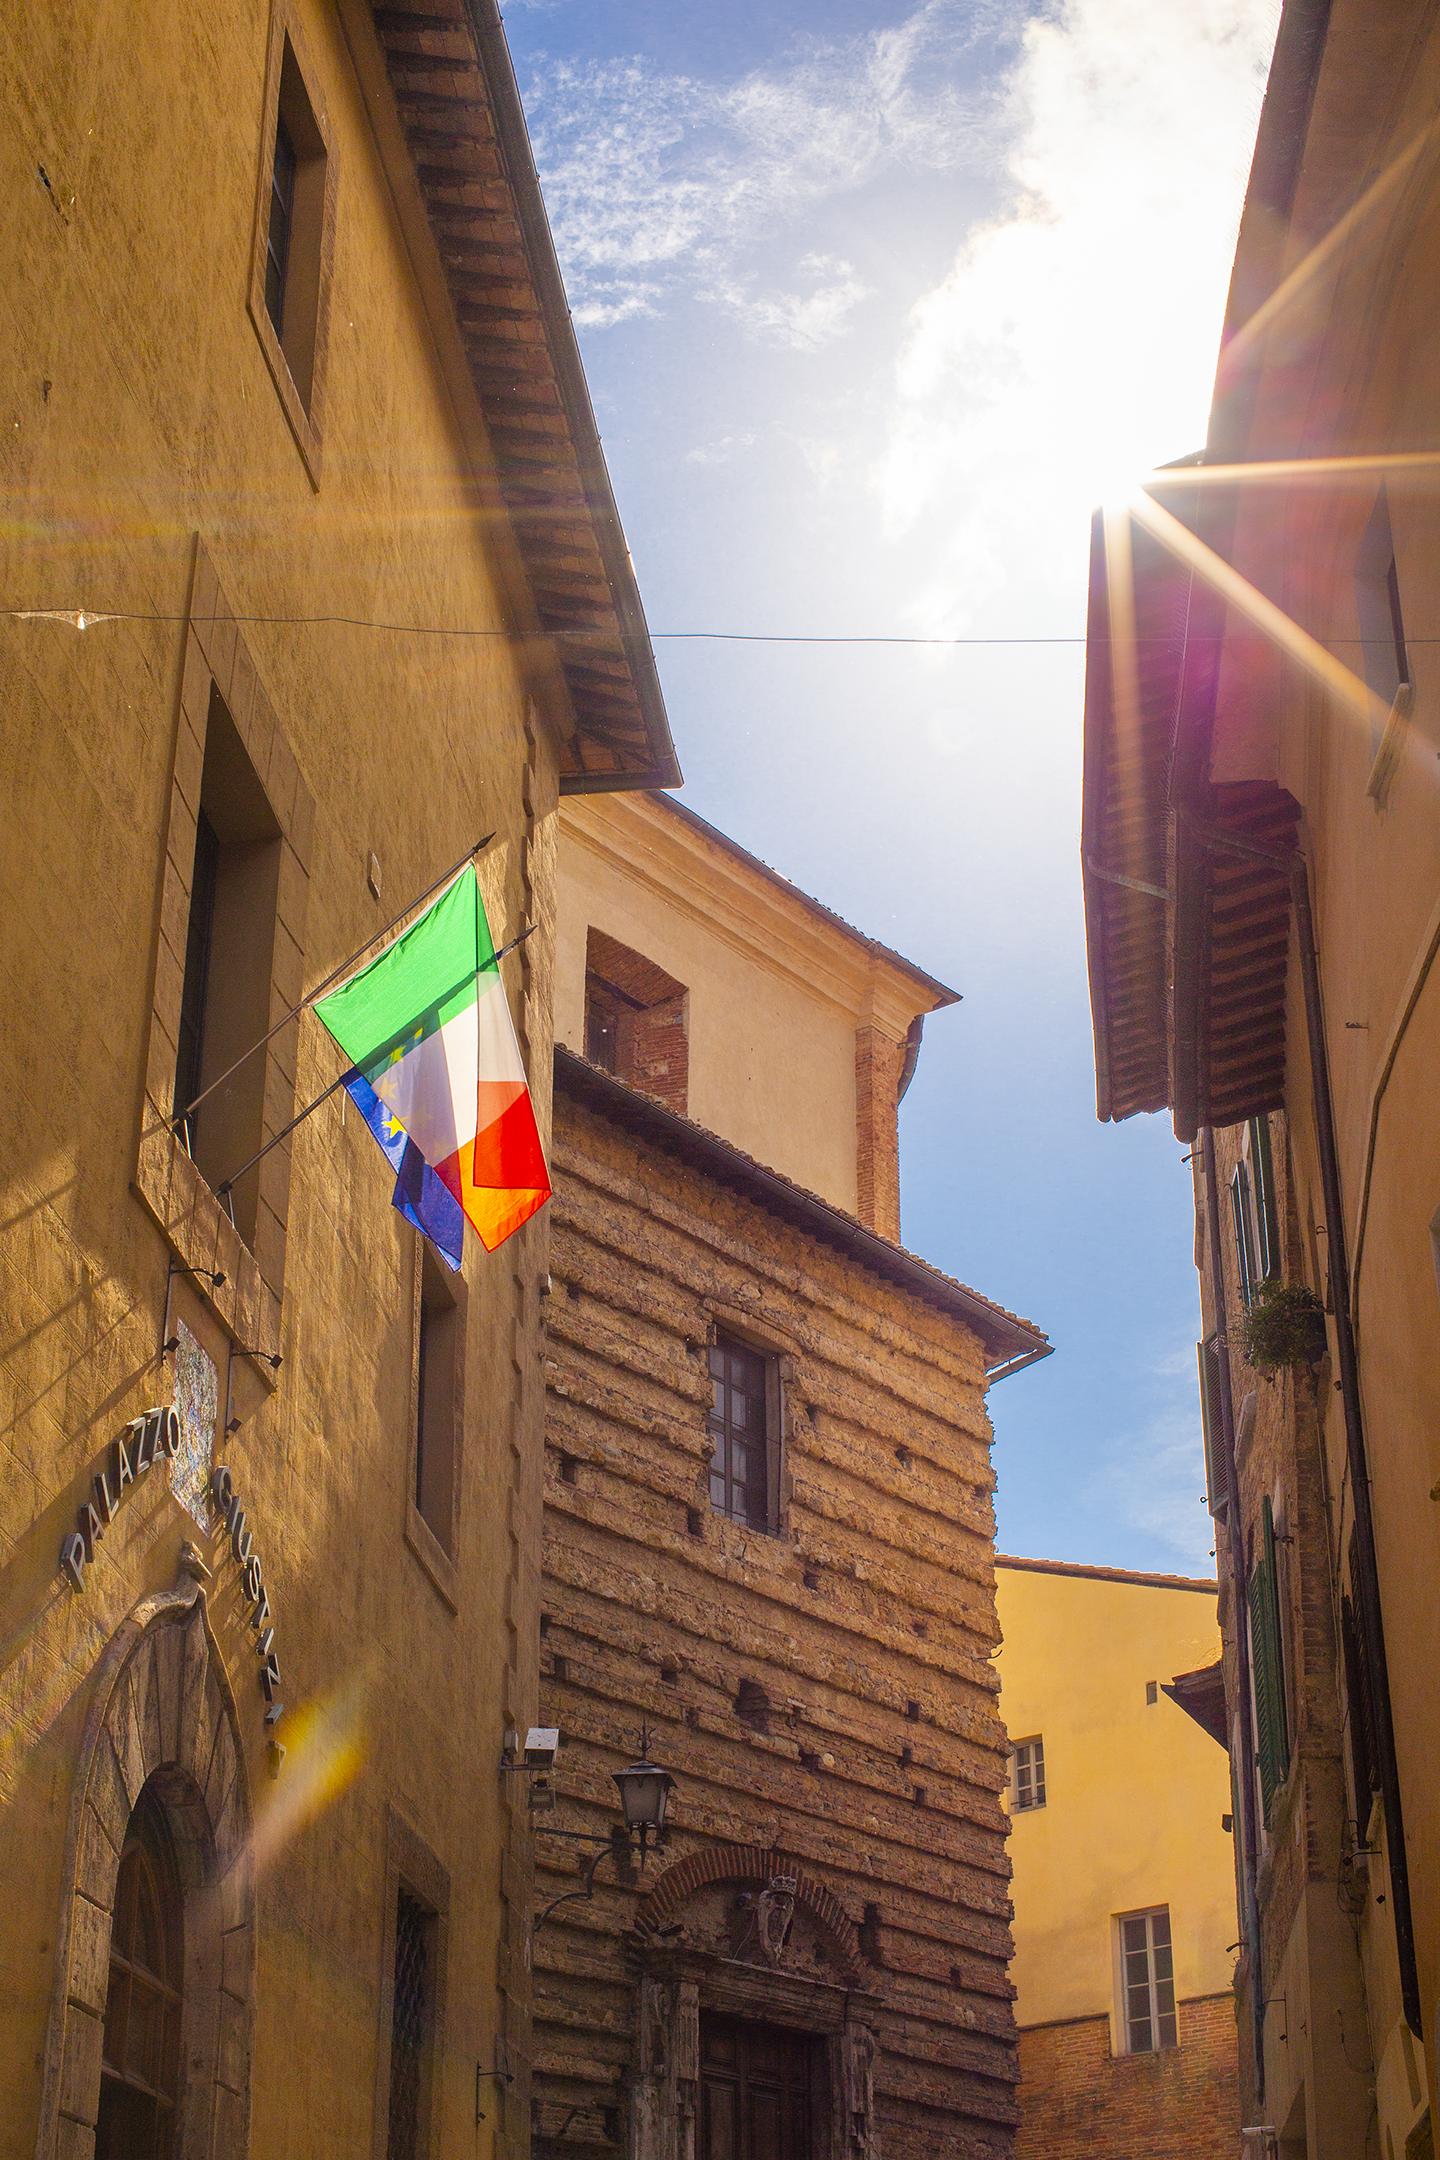 montepulciano italy flag